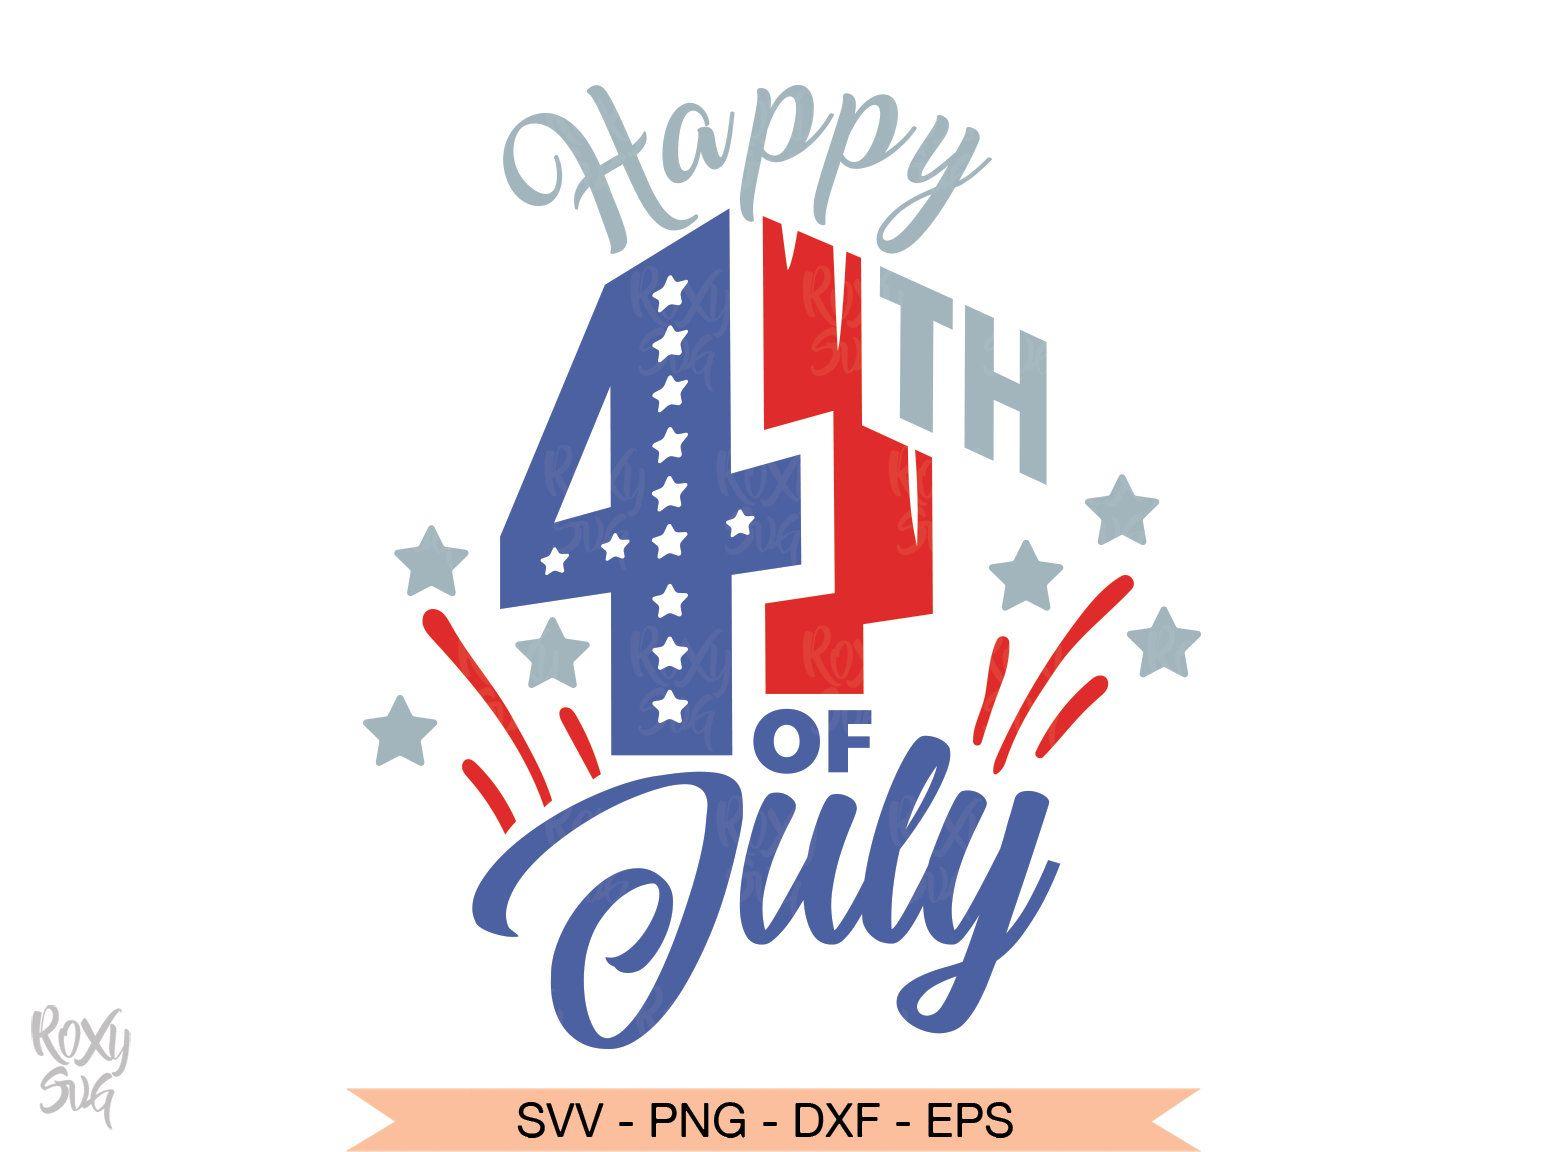 Happy 4th Of July Svg American Flag Patriotic Clipart Etsy 4th Of July Images Happy 4 Of July 4th Of July